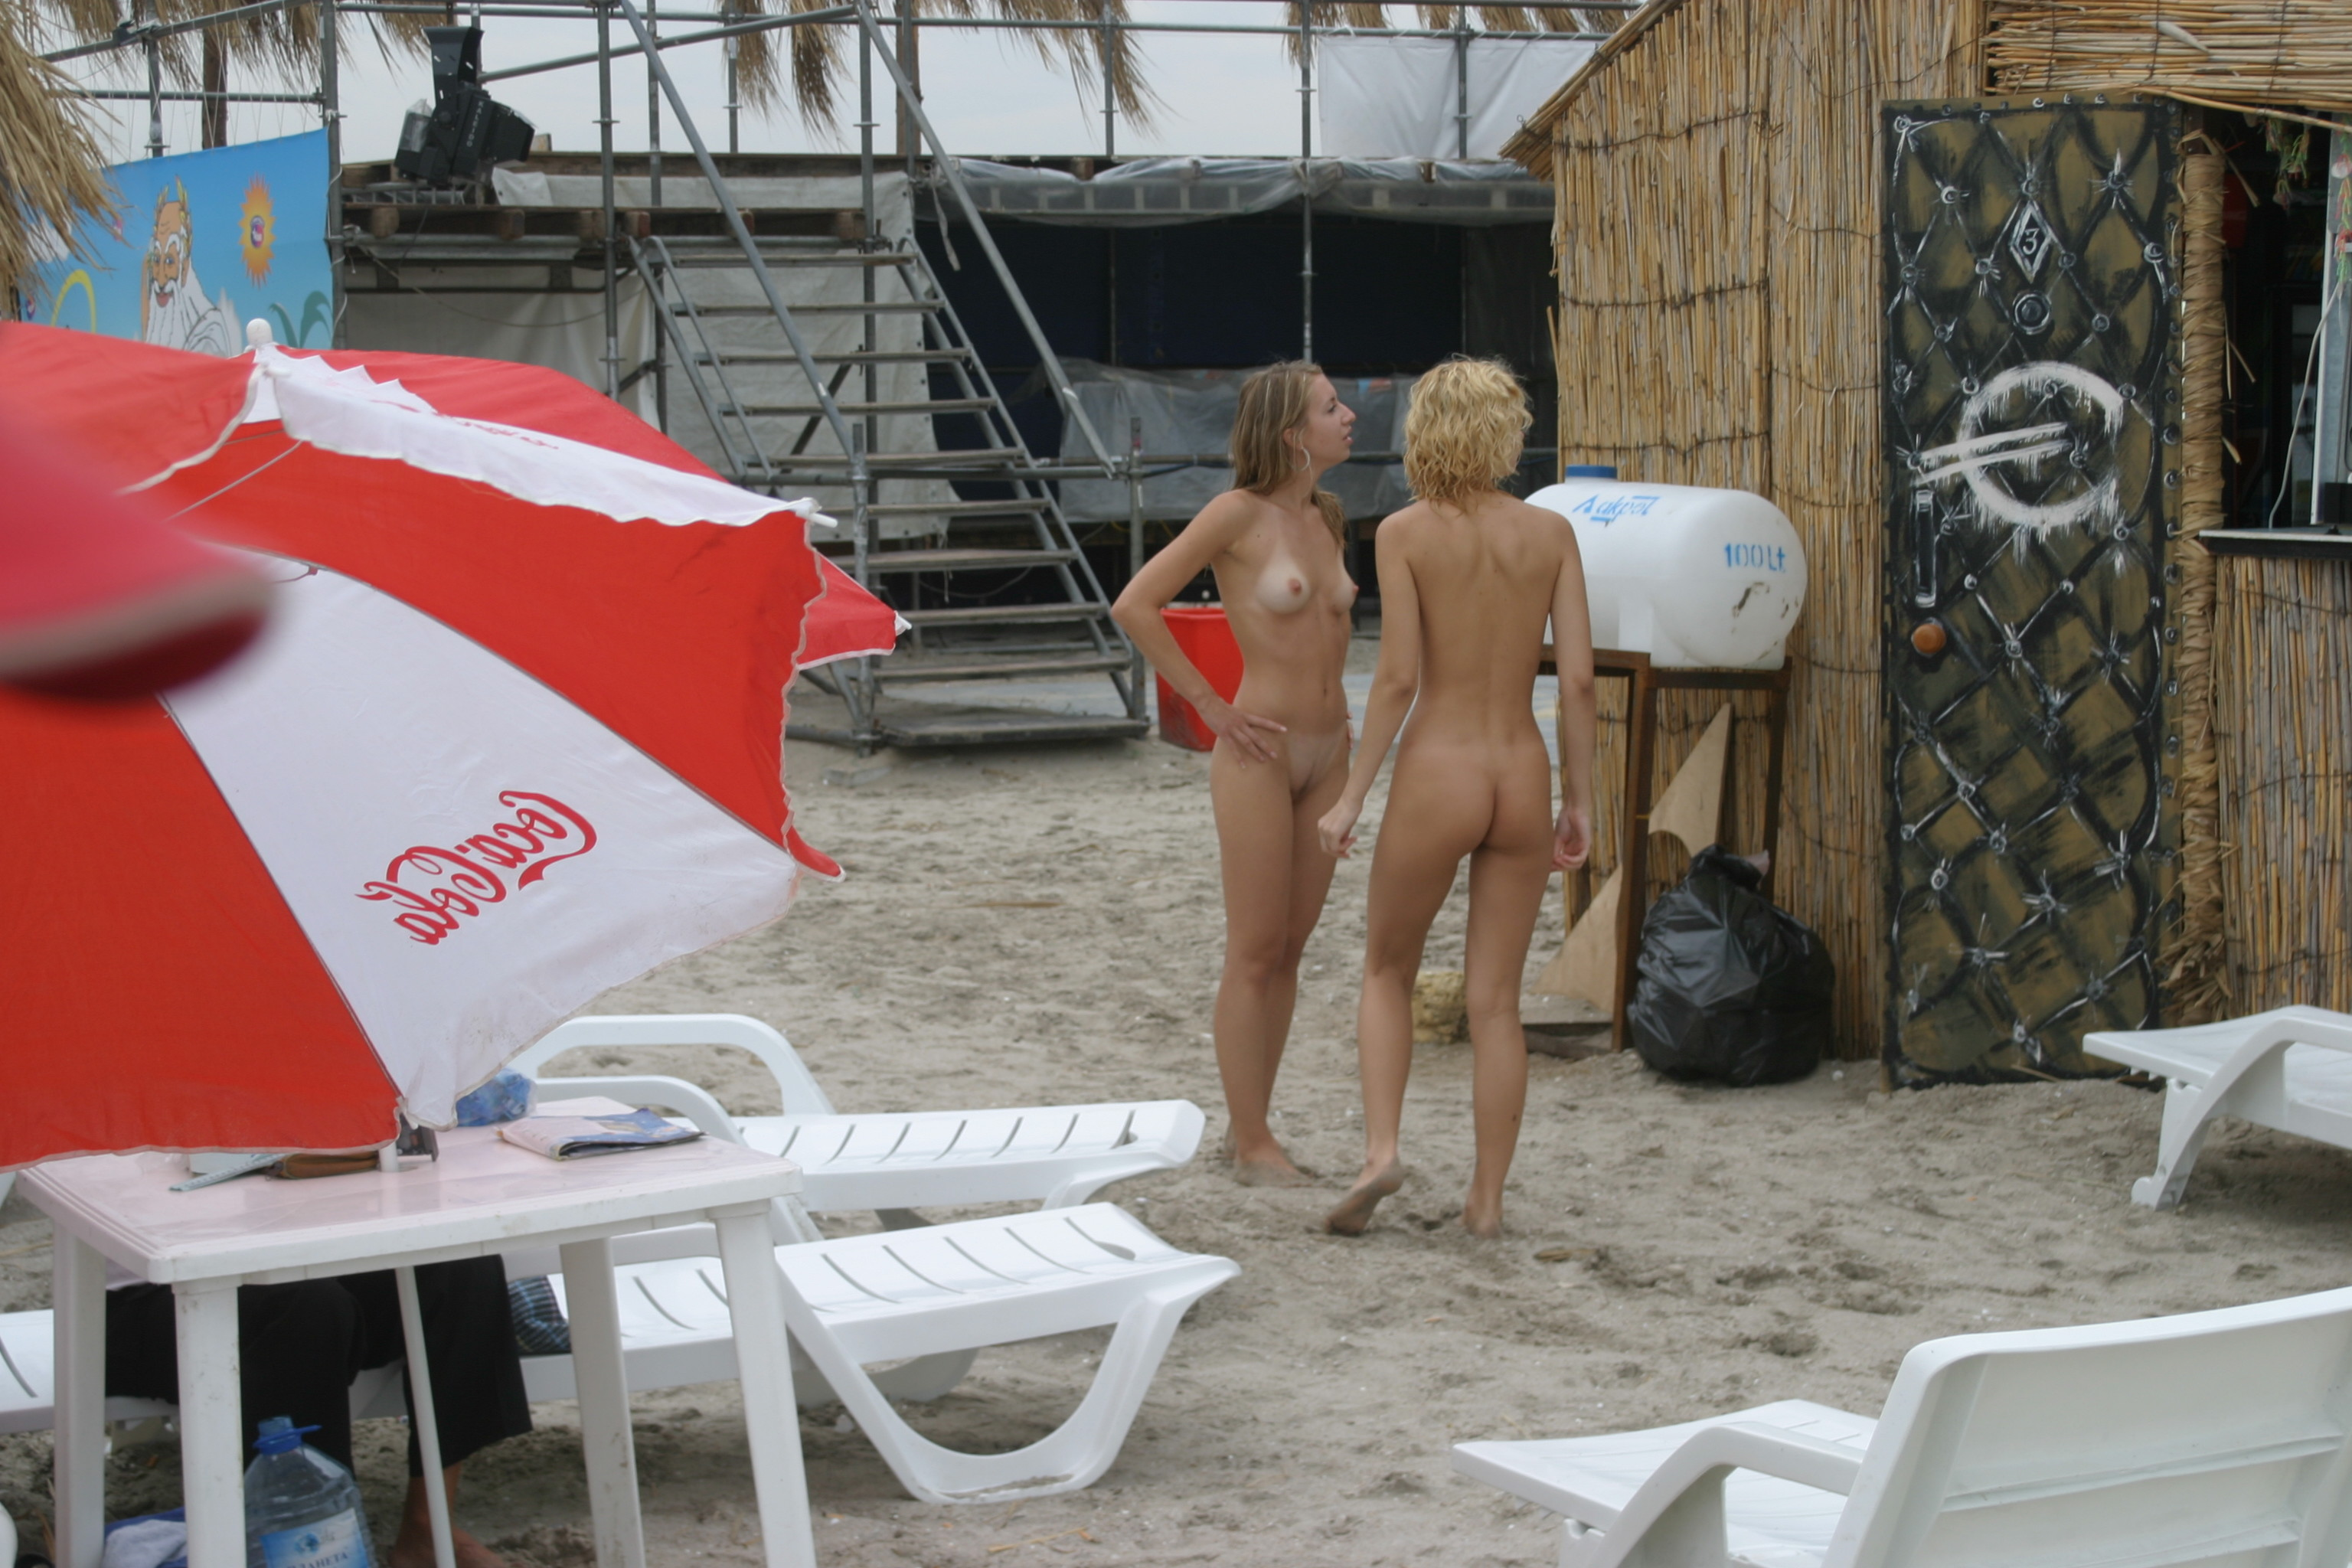 vika-y-lena-l-beach-nude-in-public-metart-07